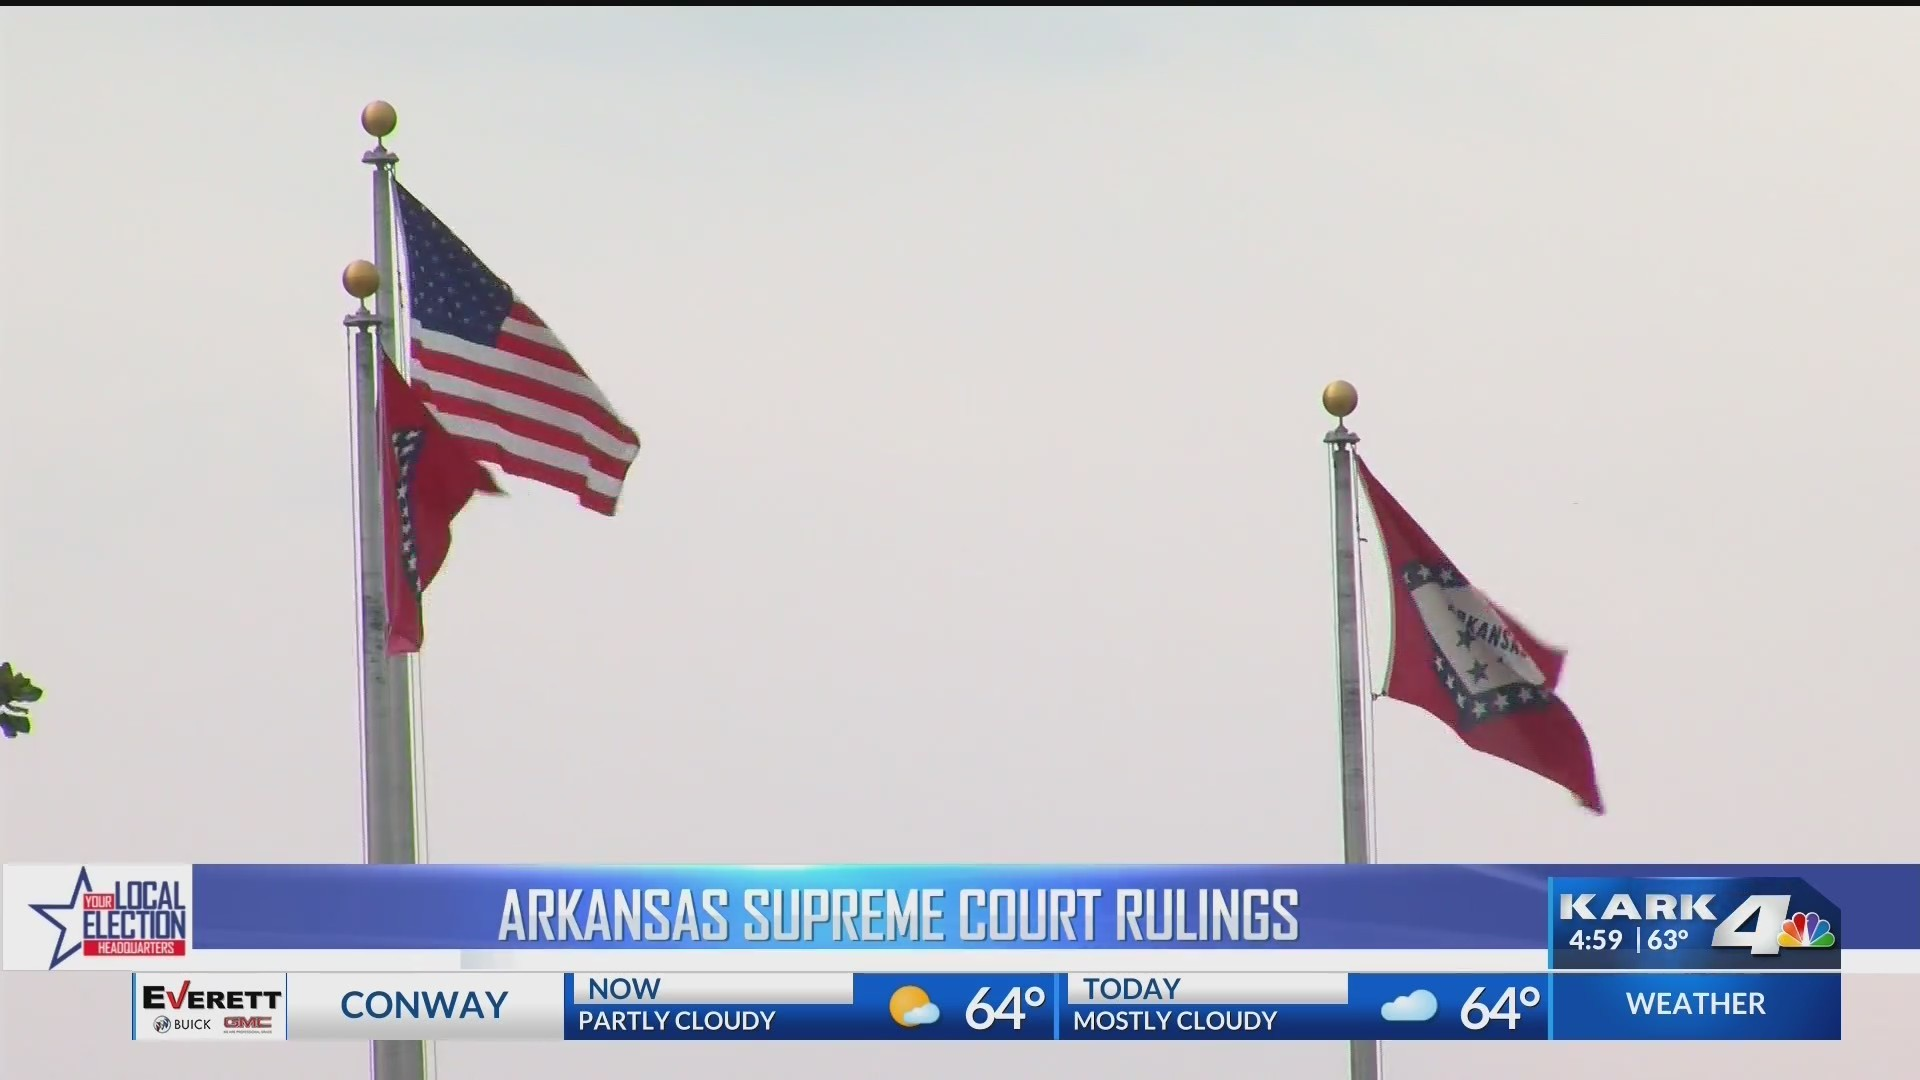 Arkansas_Supreme_Court_Rulings_1_20181018225923